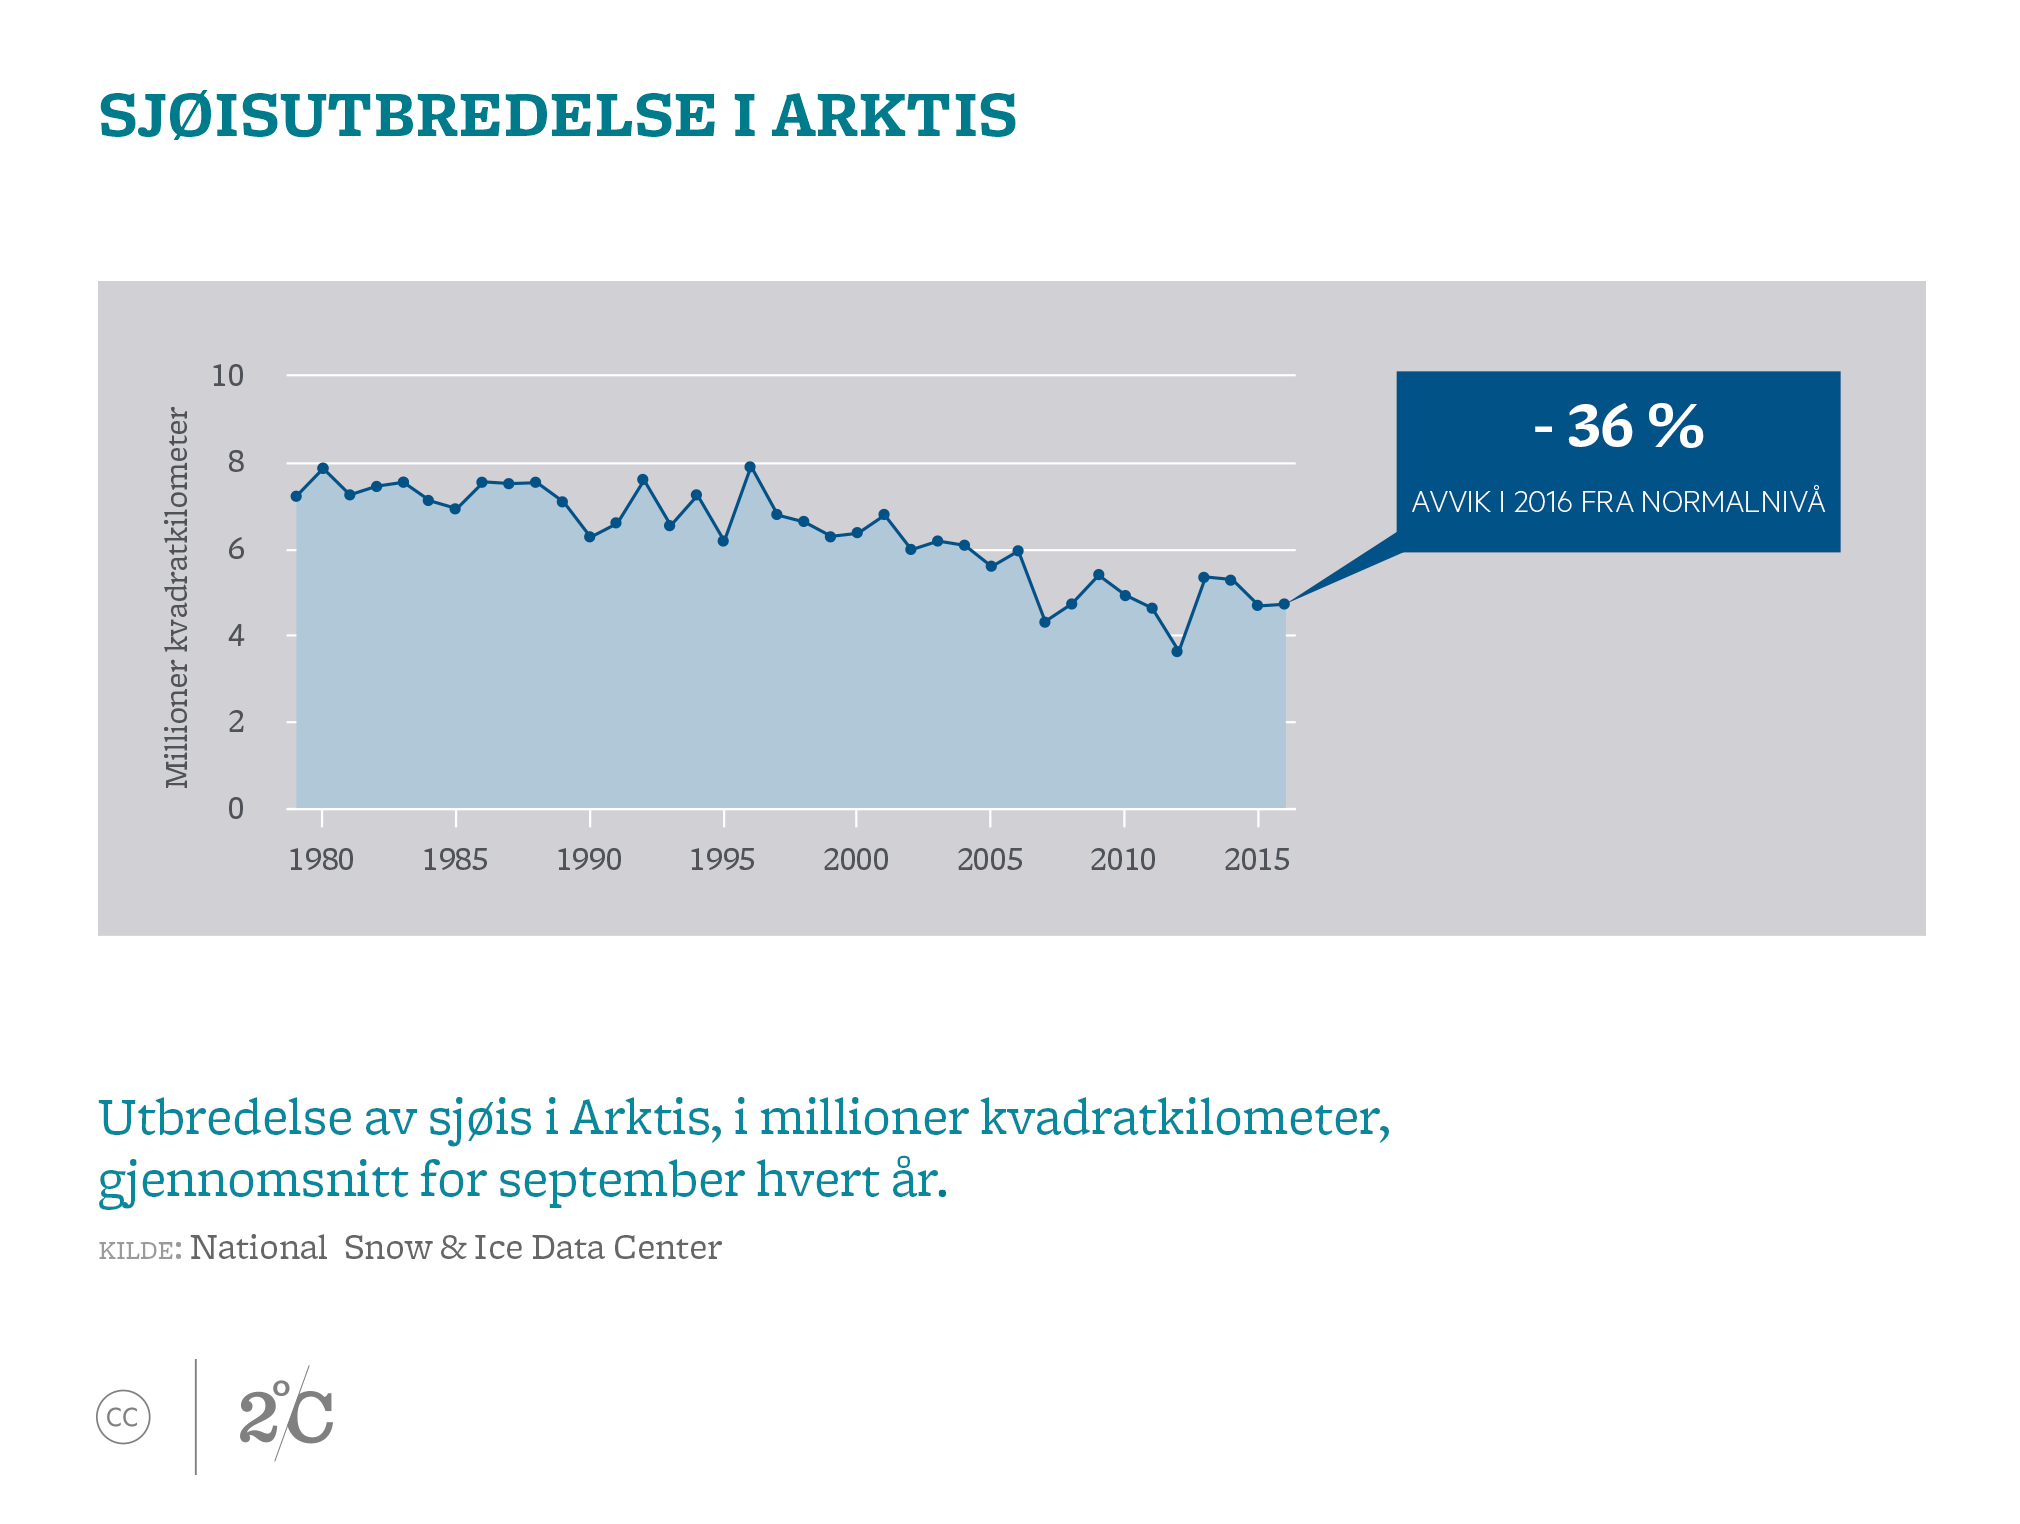 Sjøisutbredelse i Arktis. Illustrasjon: Norsk KlimastiftelseClick and drag to move